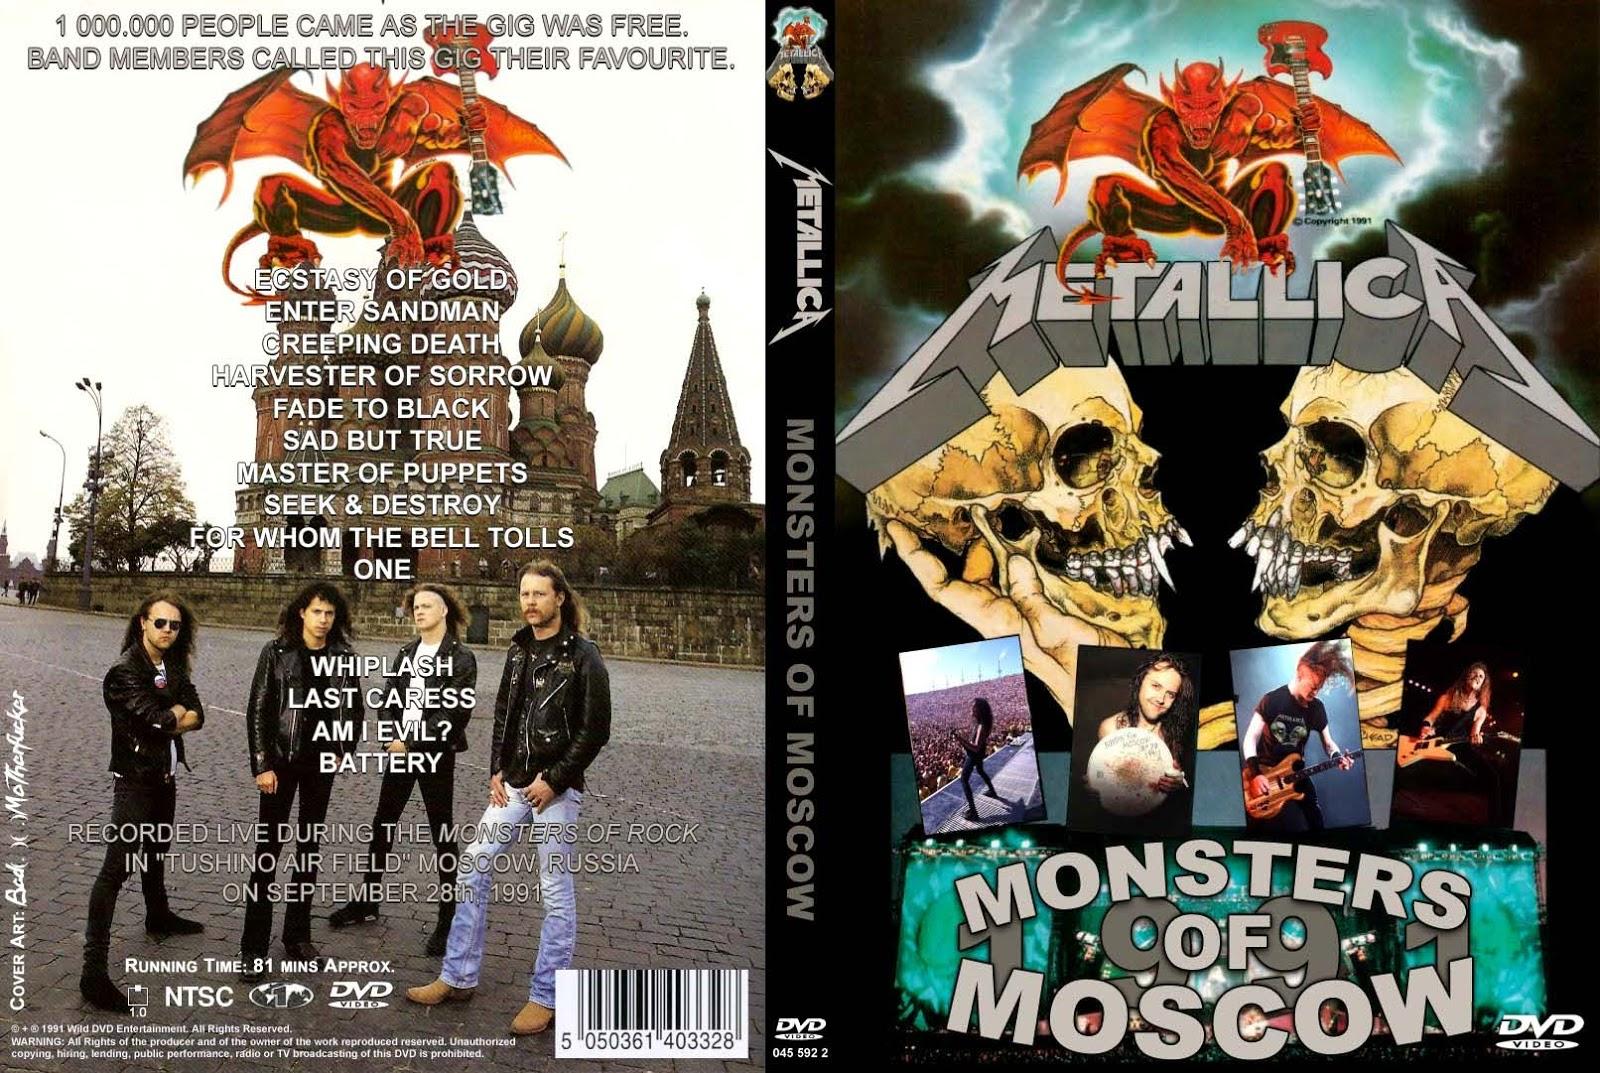 T.U.B.E.: Metallica - 1991-09-28 - Moscow, Soviet Union